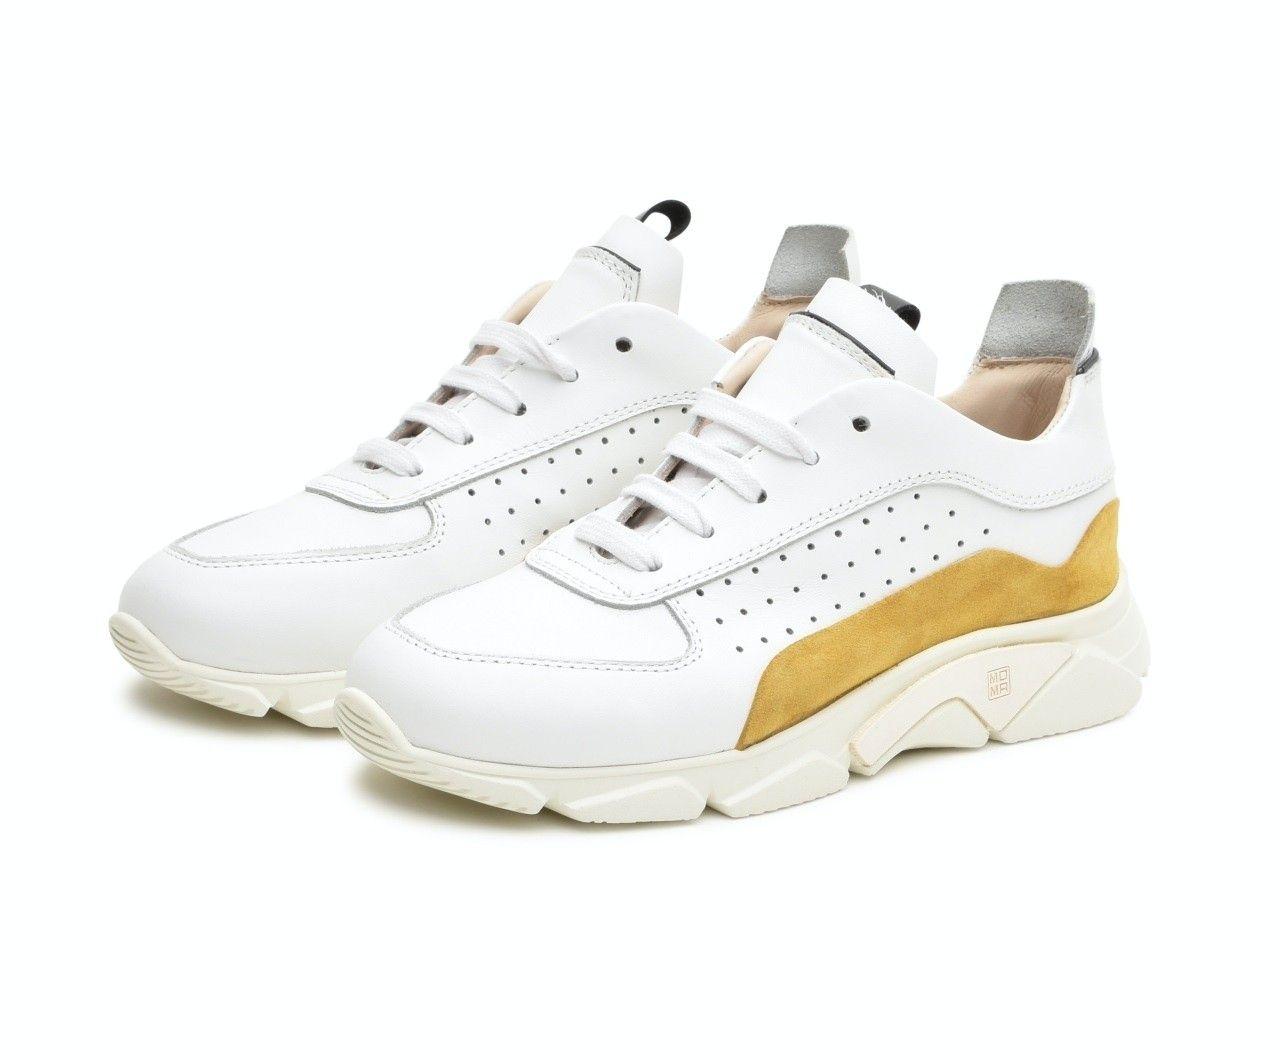 MOMA - Damen Sneaker - Box Tony - Bianco & Mandarino